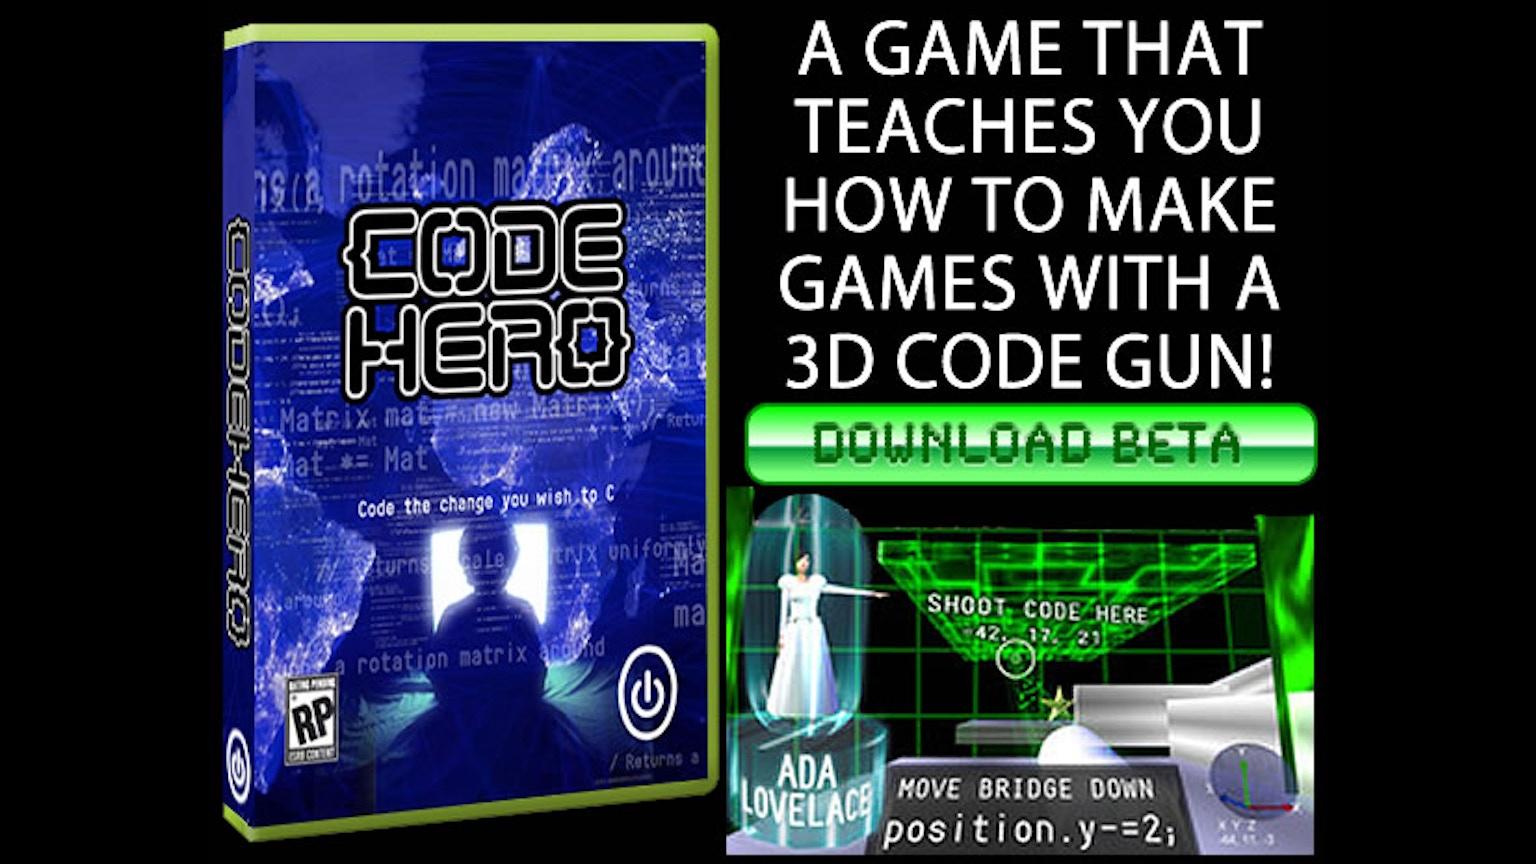 code hero a game that teaches you to make gamesalex